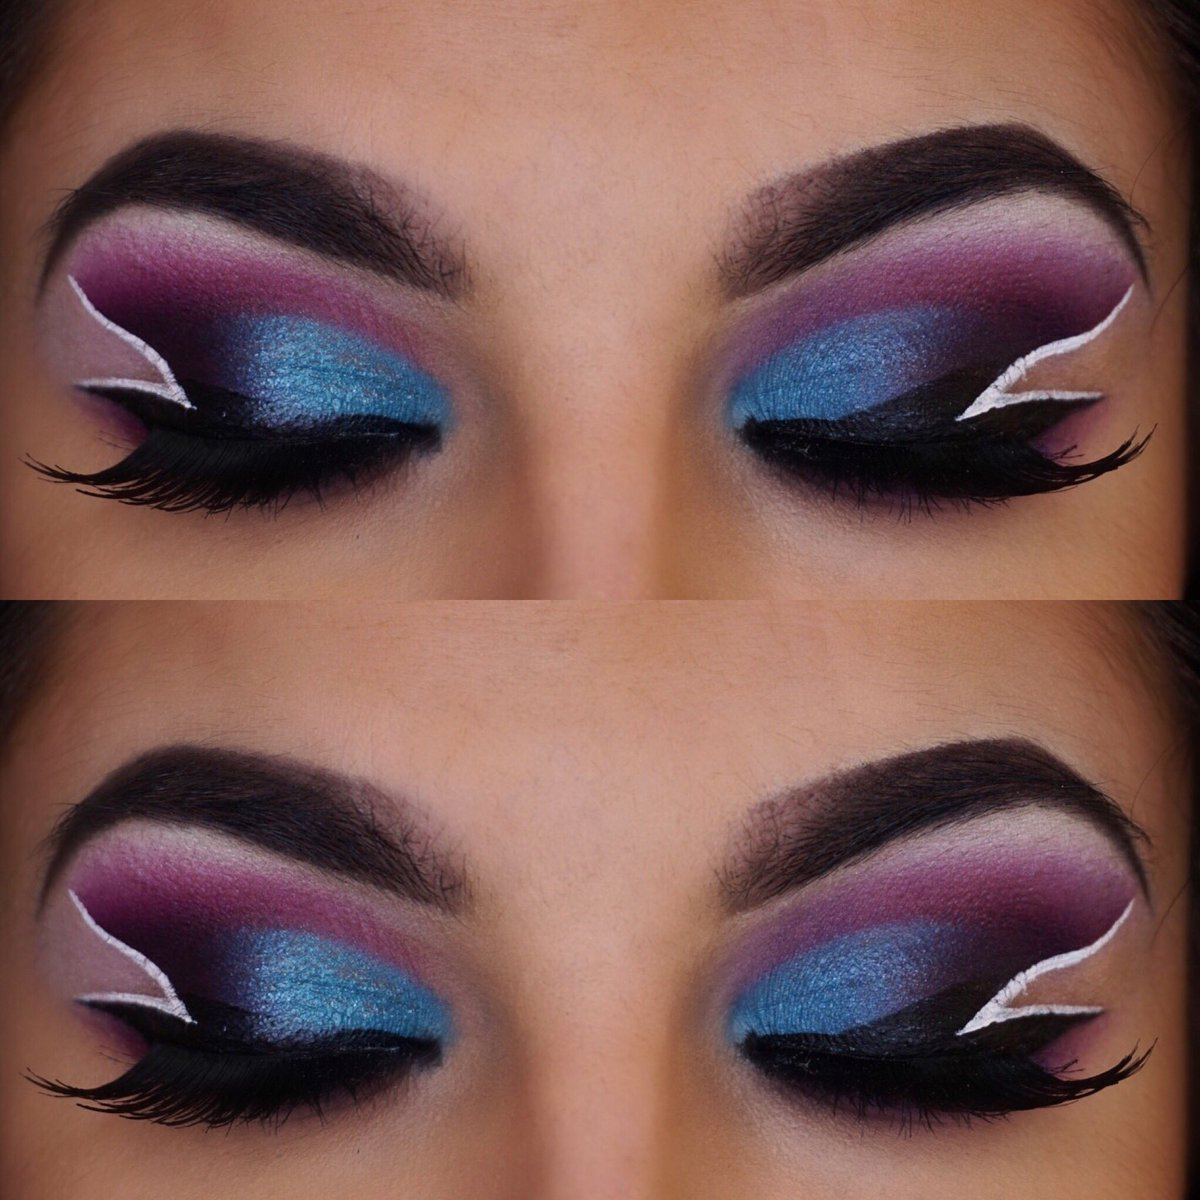 Make Up Cosmesi: Problemi con mascara trucco e eyeliner